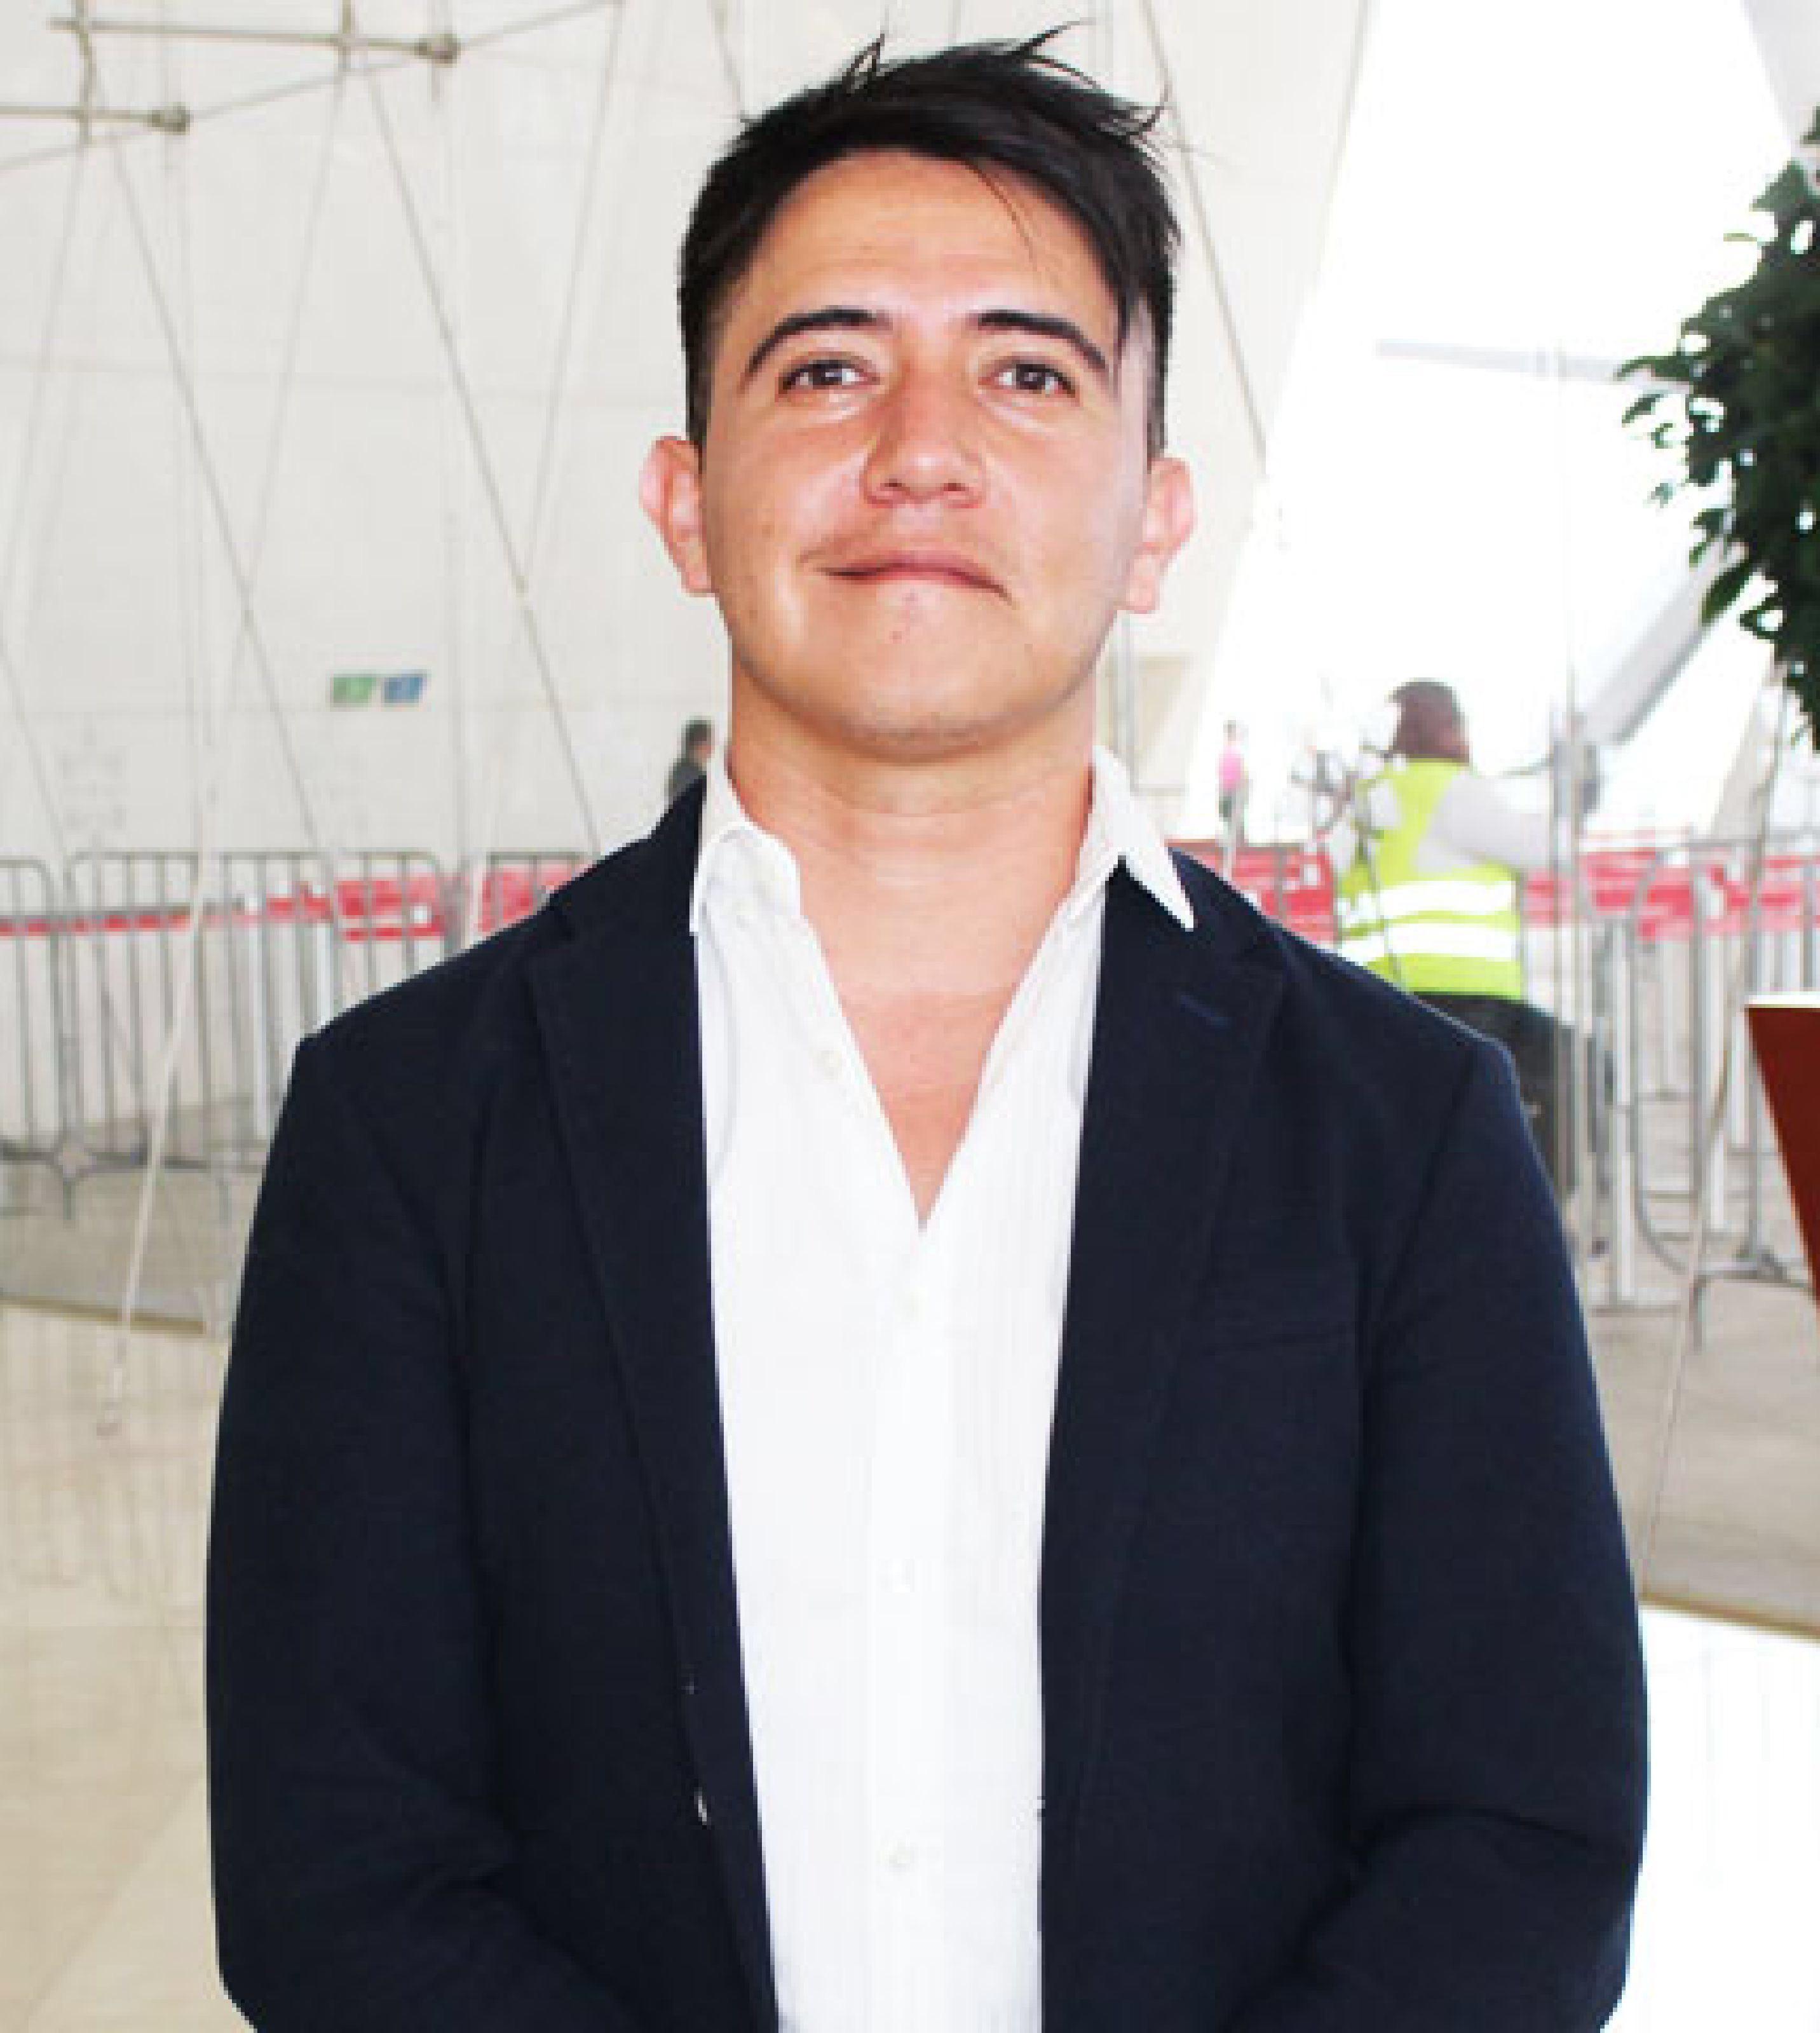 Arturo Cataño